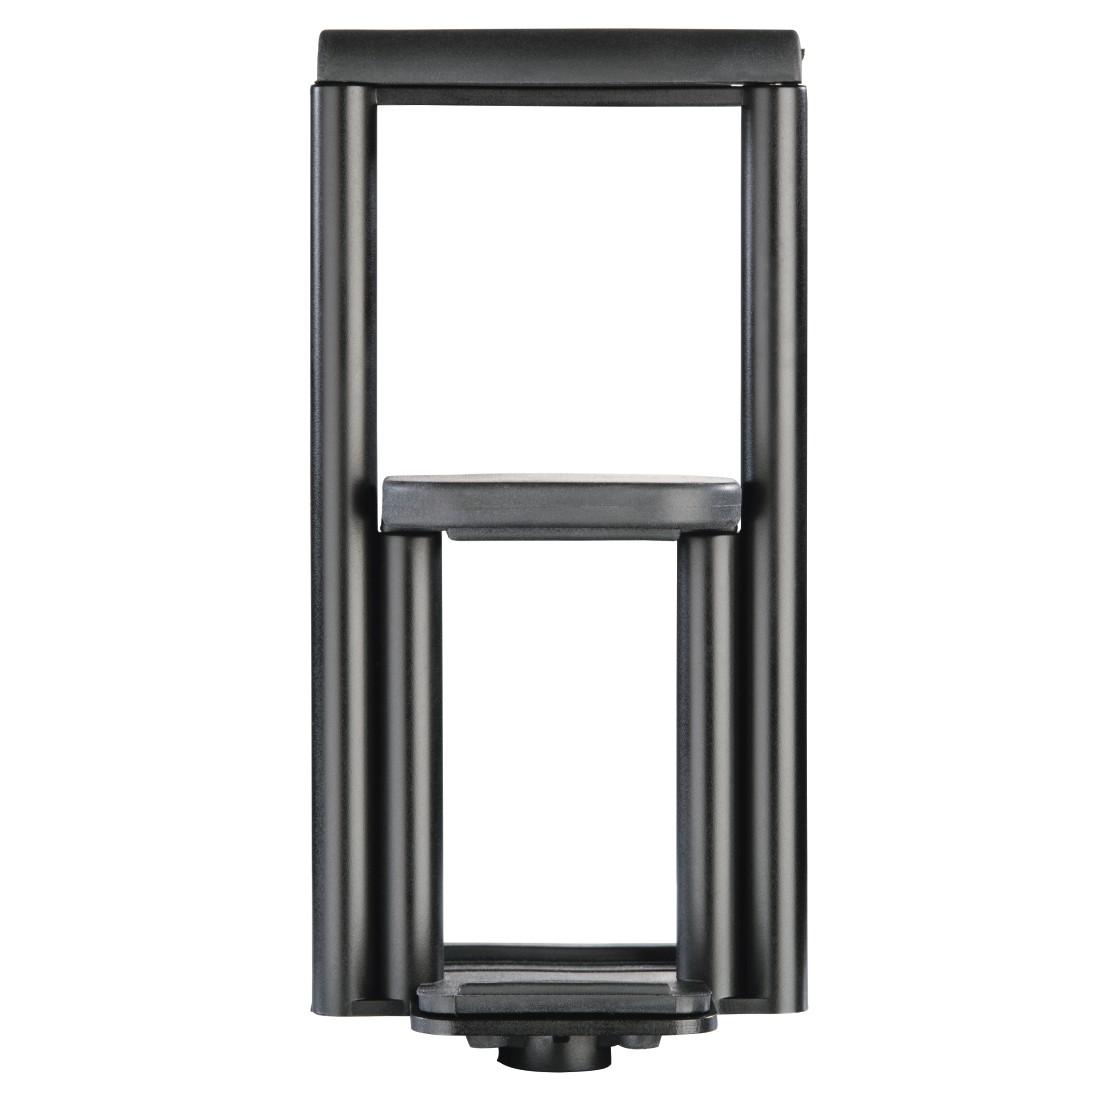 00004625 hama smartphone tablethalterung f r blitzschuh und an dslr mit wifi. Black Bedroom Furniture Sets. Home Design Ideas